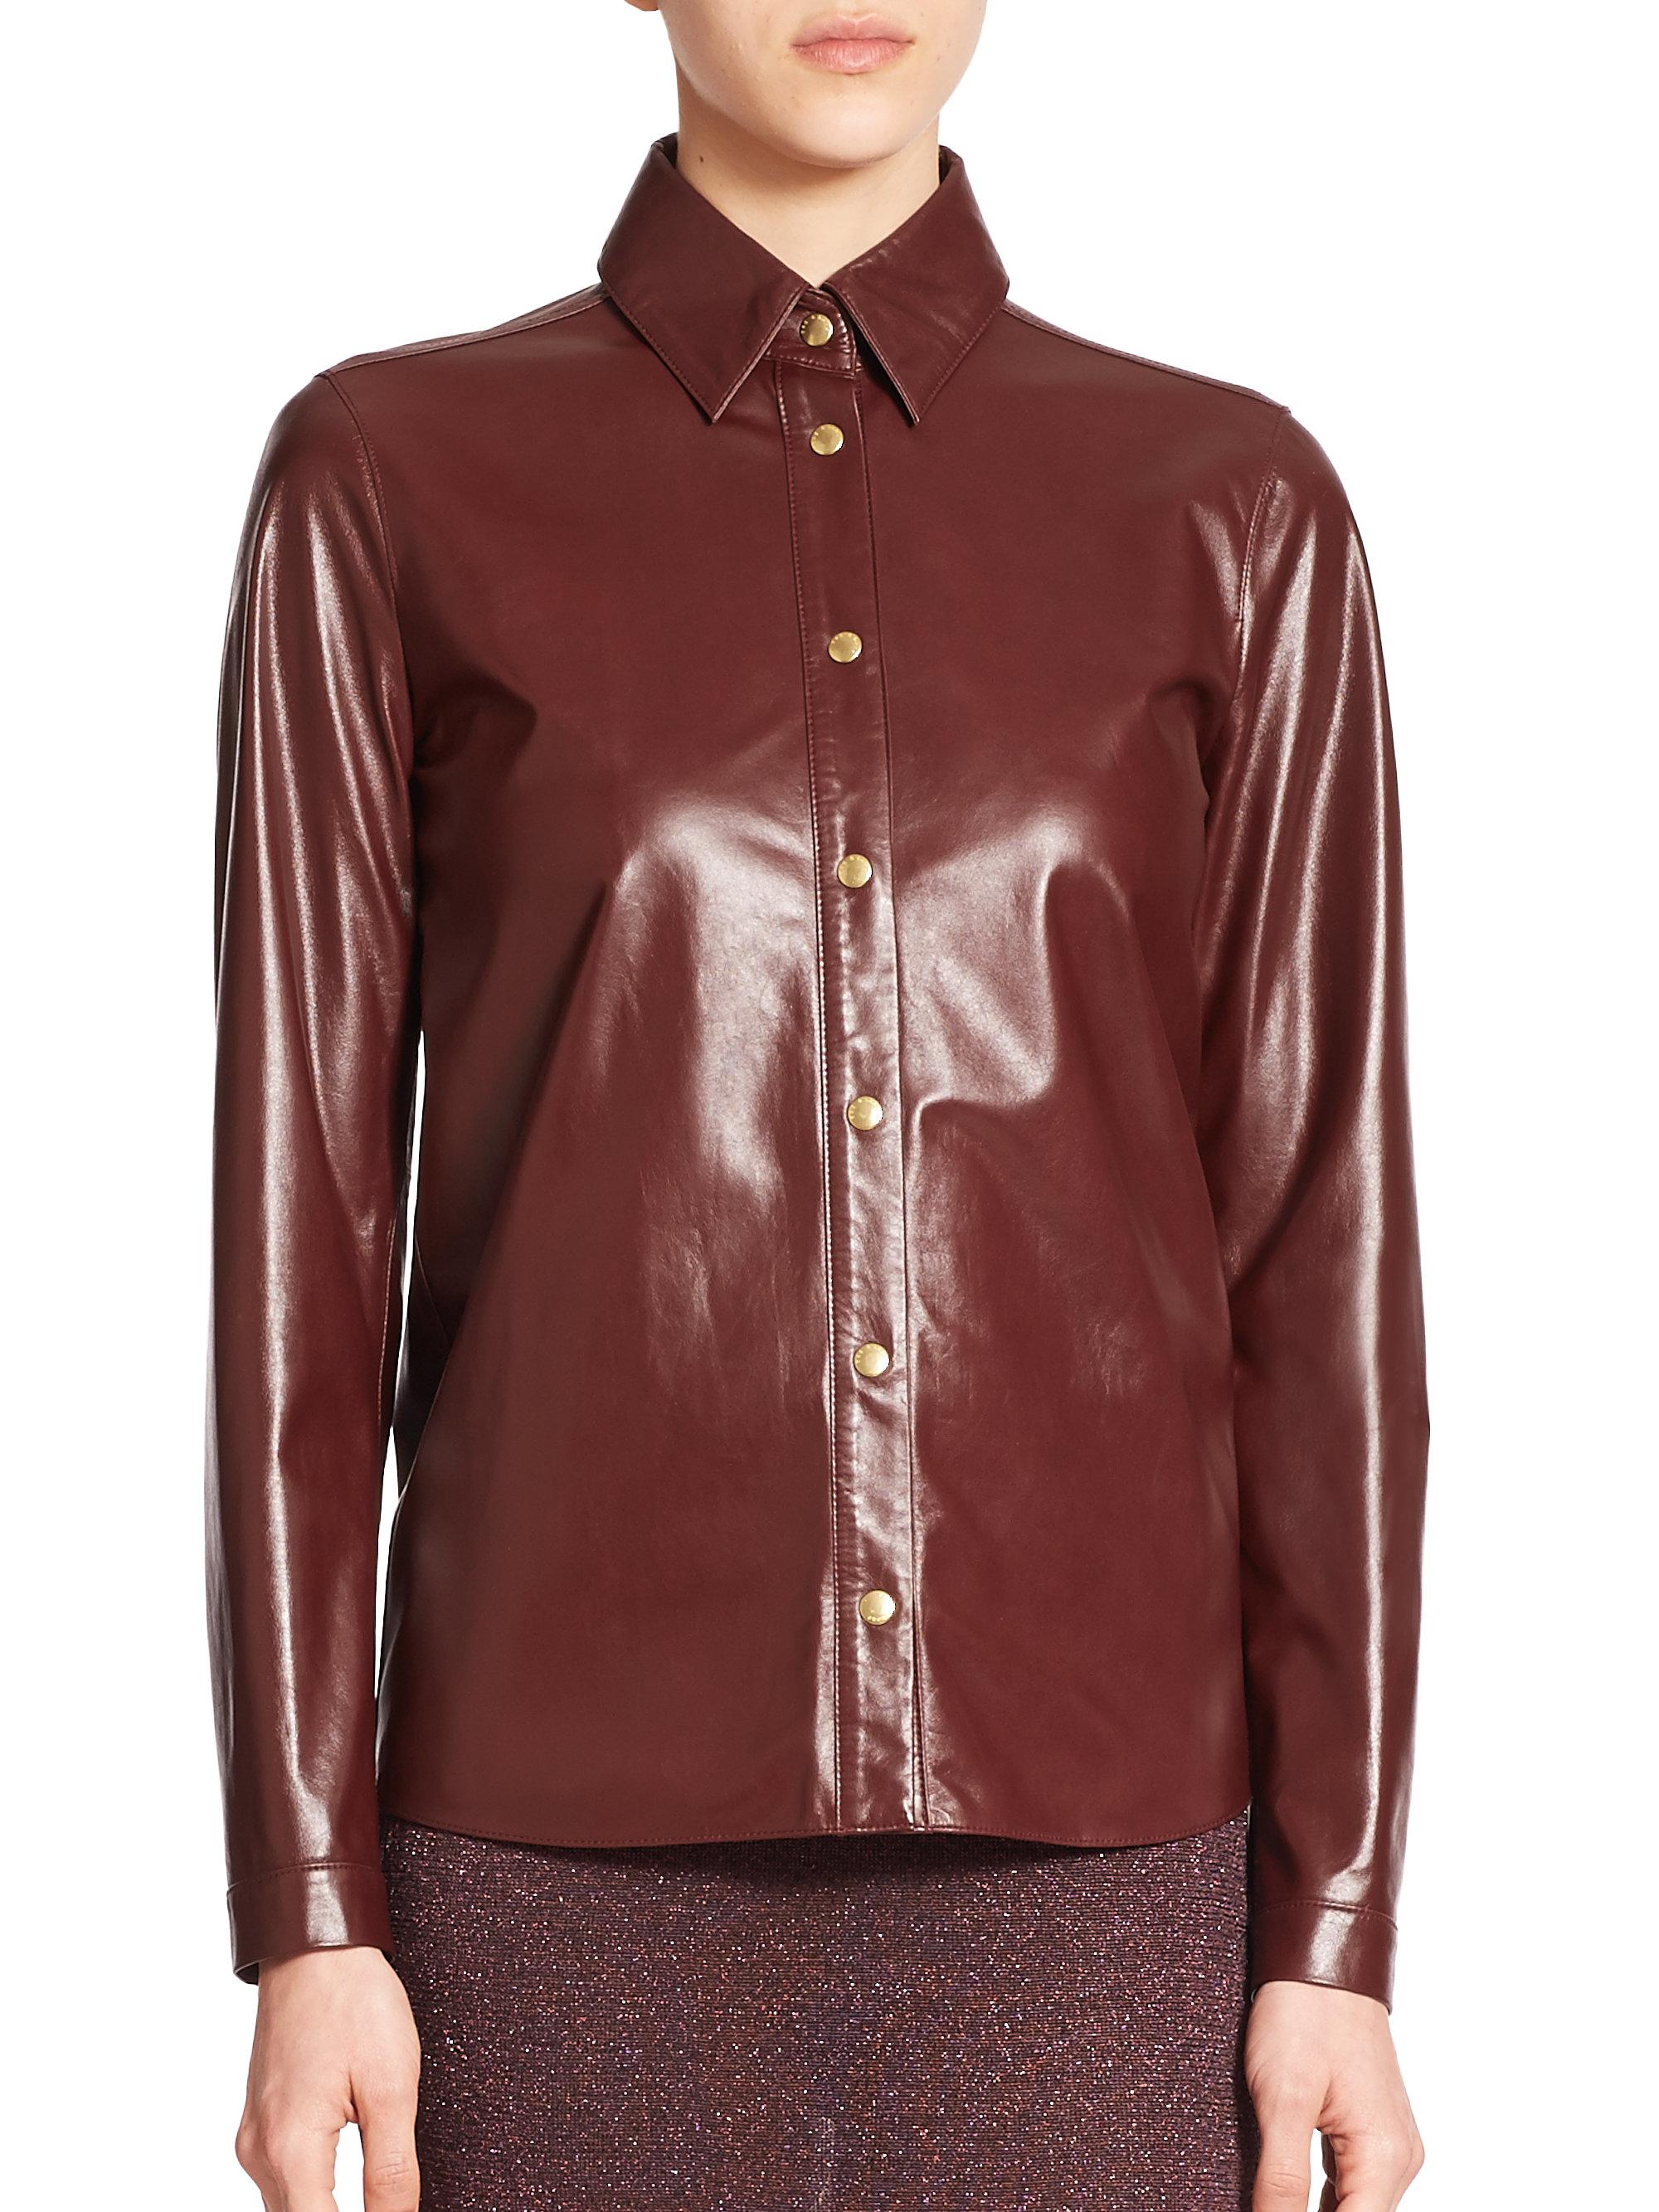 Lyst rag bone faye leather shirt in brown for Rag bone shirt